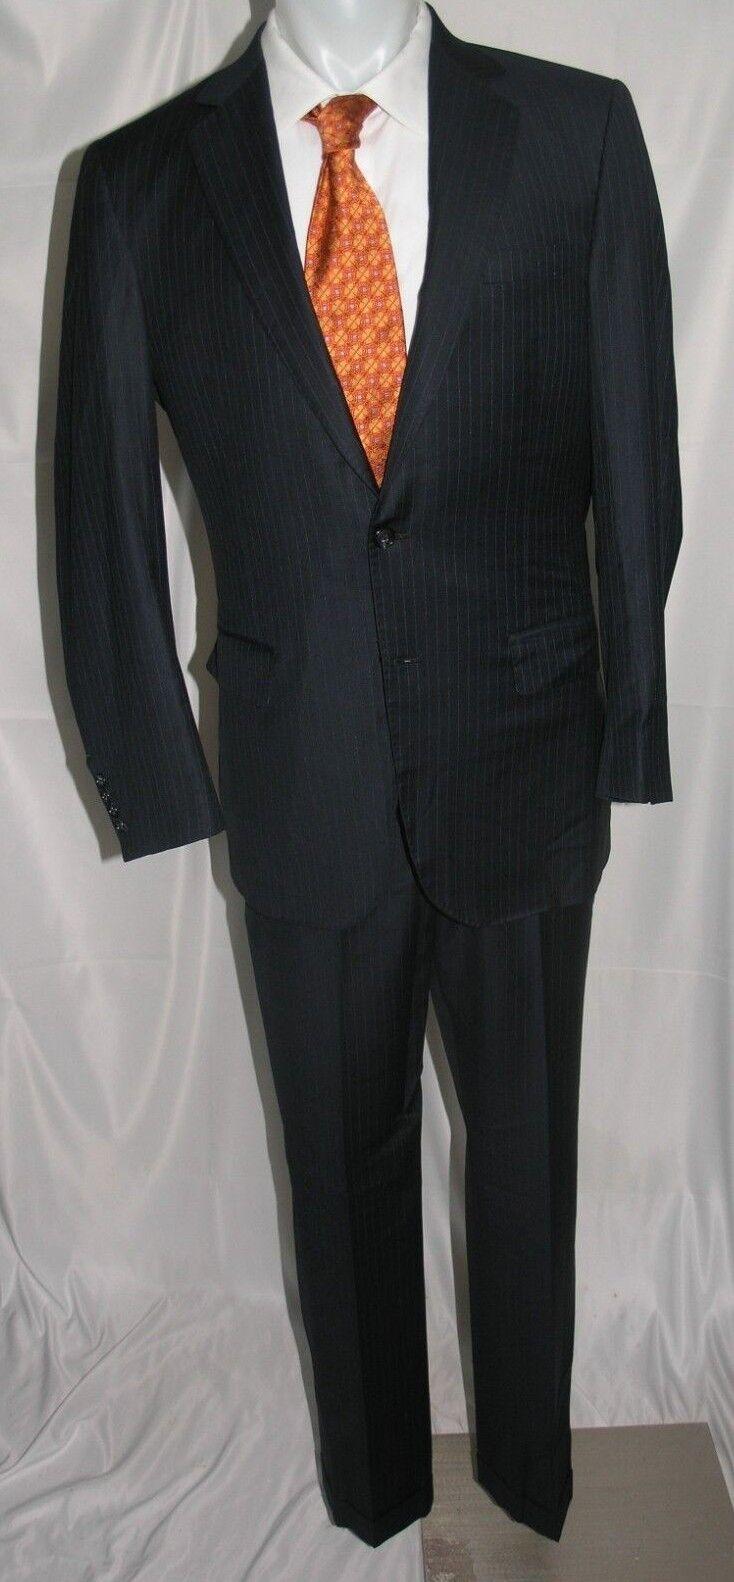 Bhambi's Two Button Flat Bespoke Suit 42 L 34 x 32